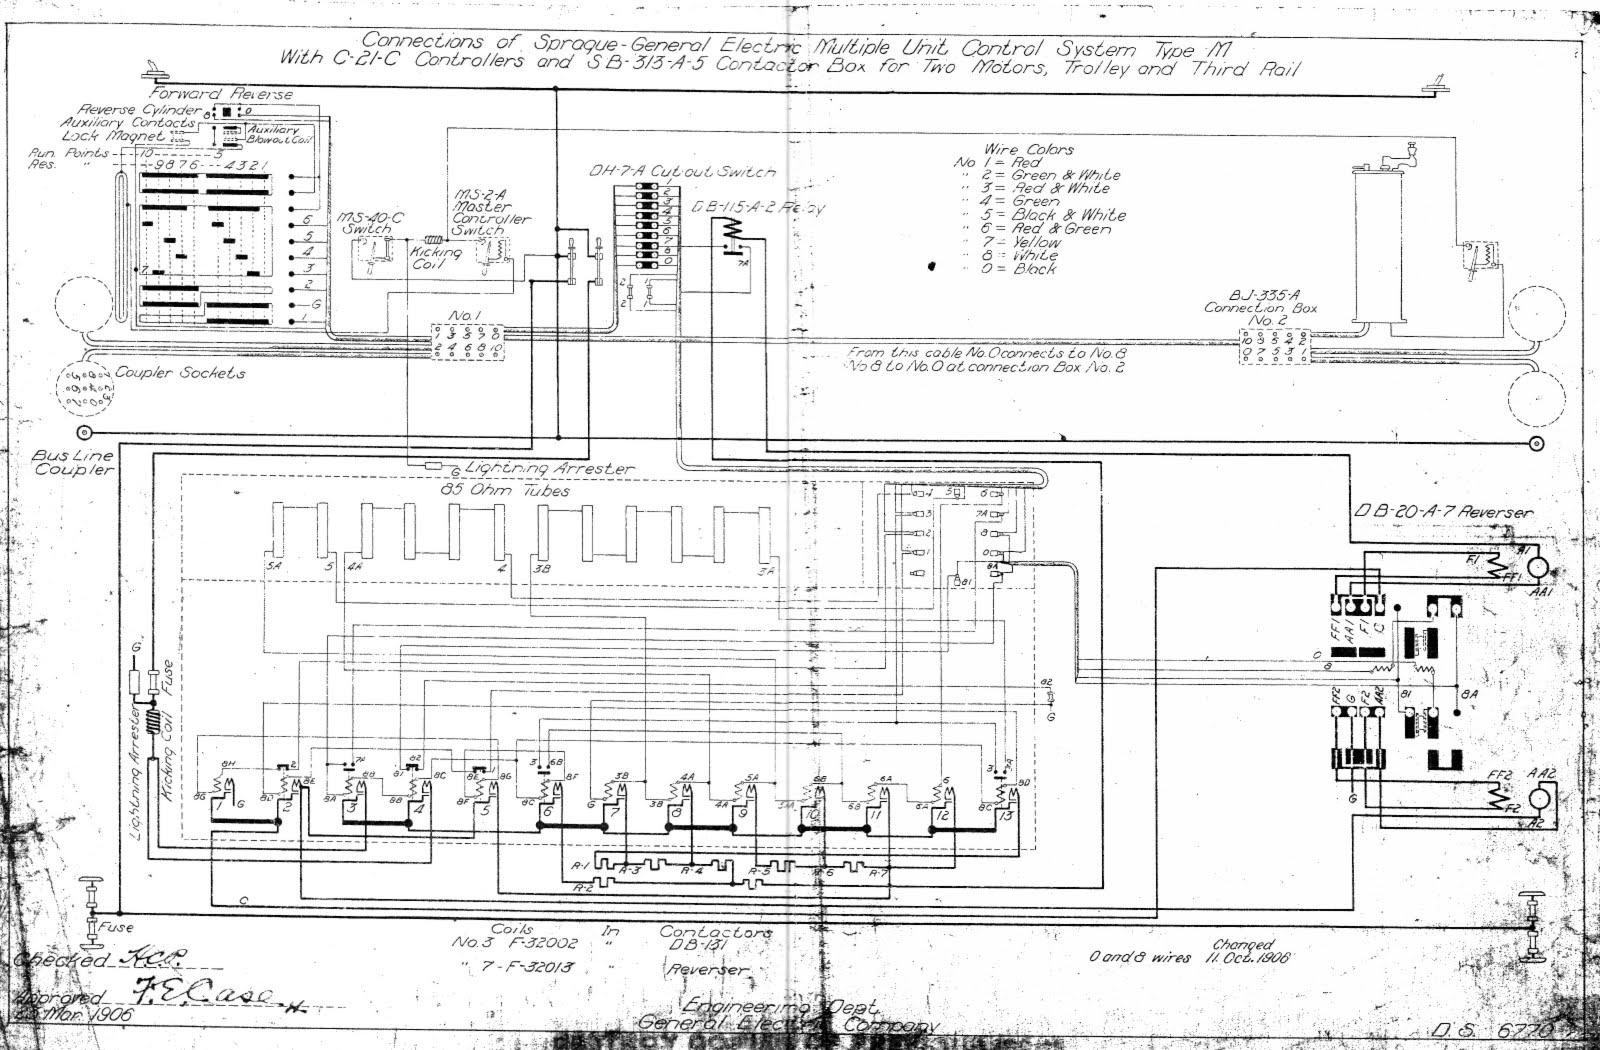 chevy chevette wiring diagram